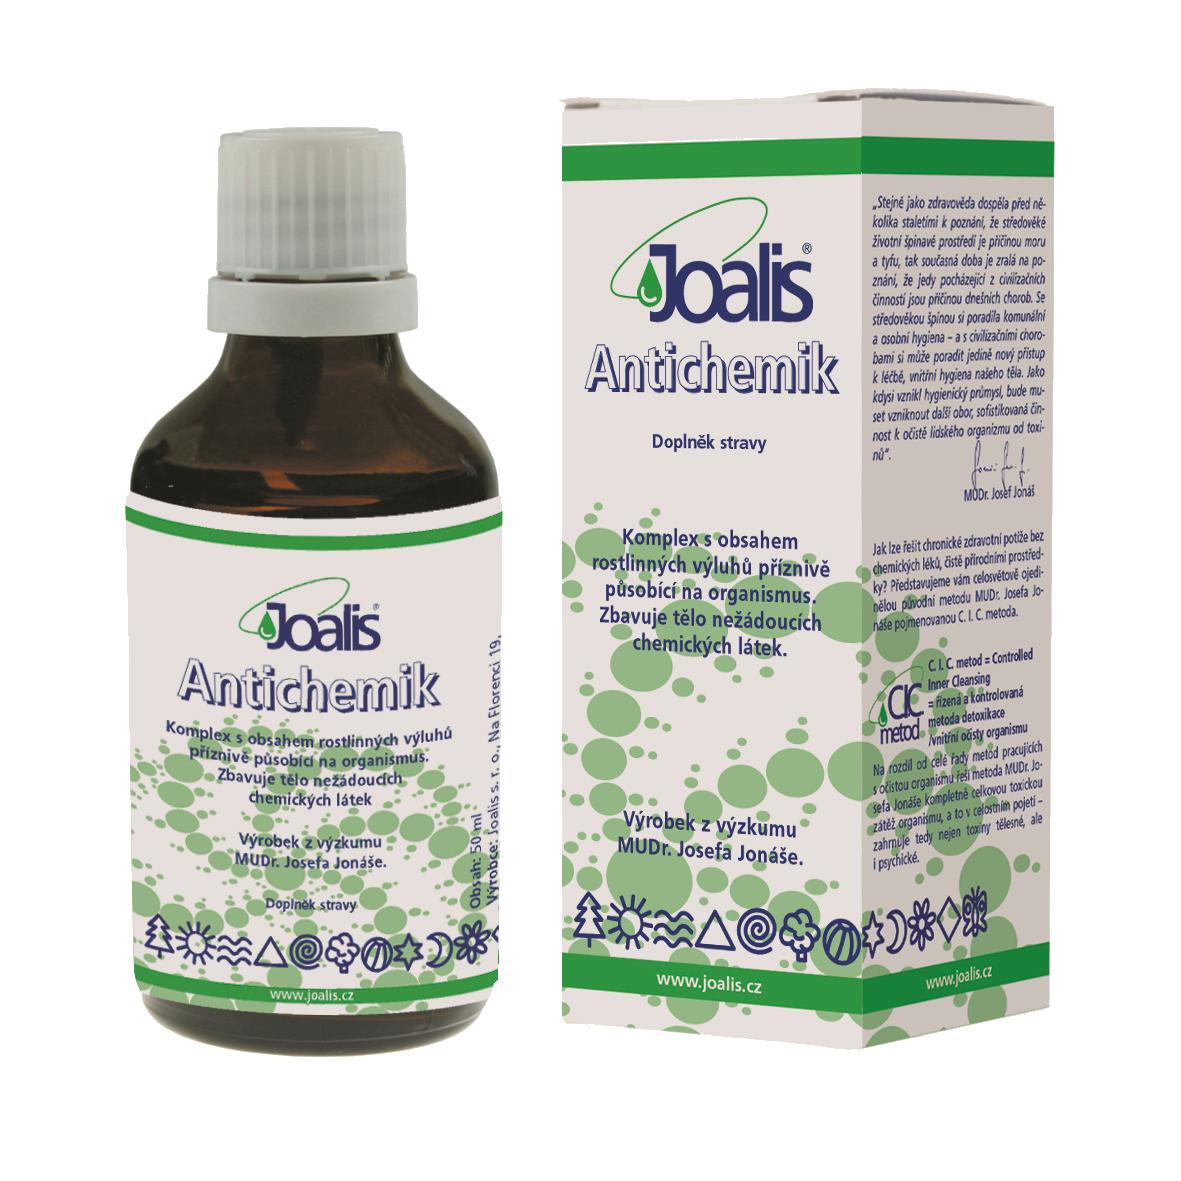 Joalis Antichemik, 50ml